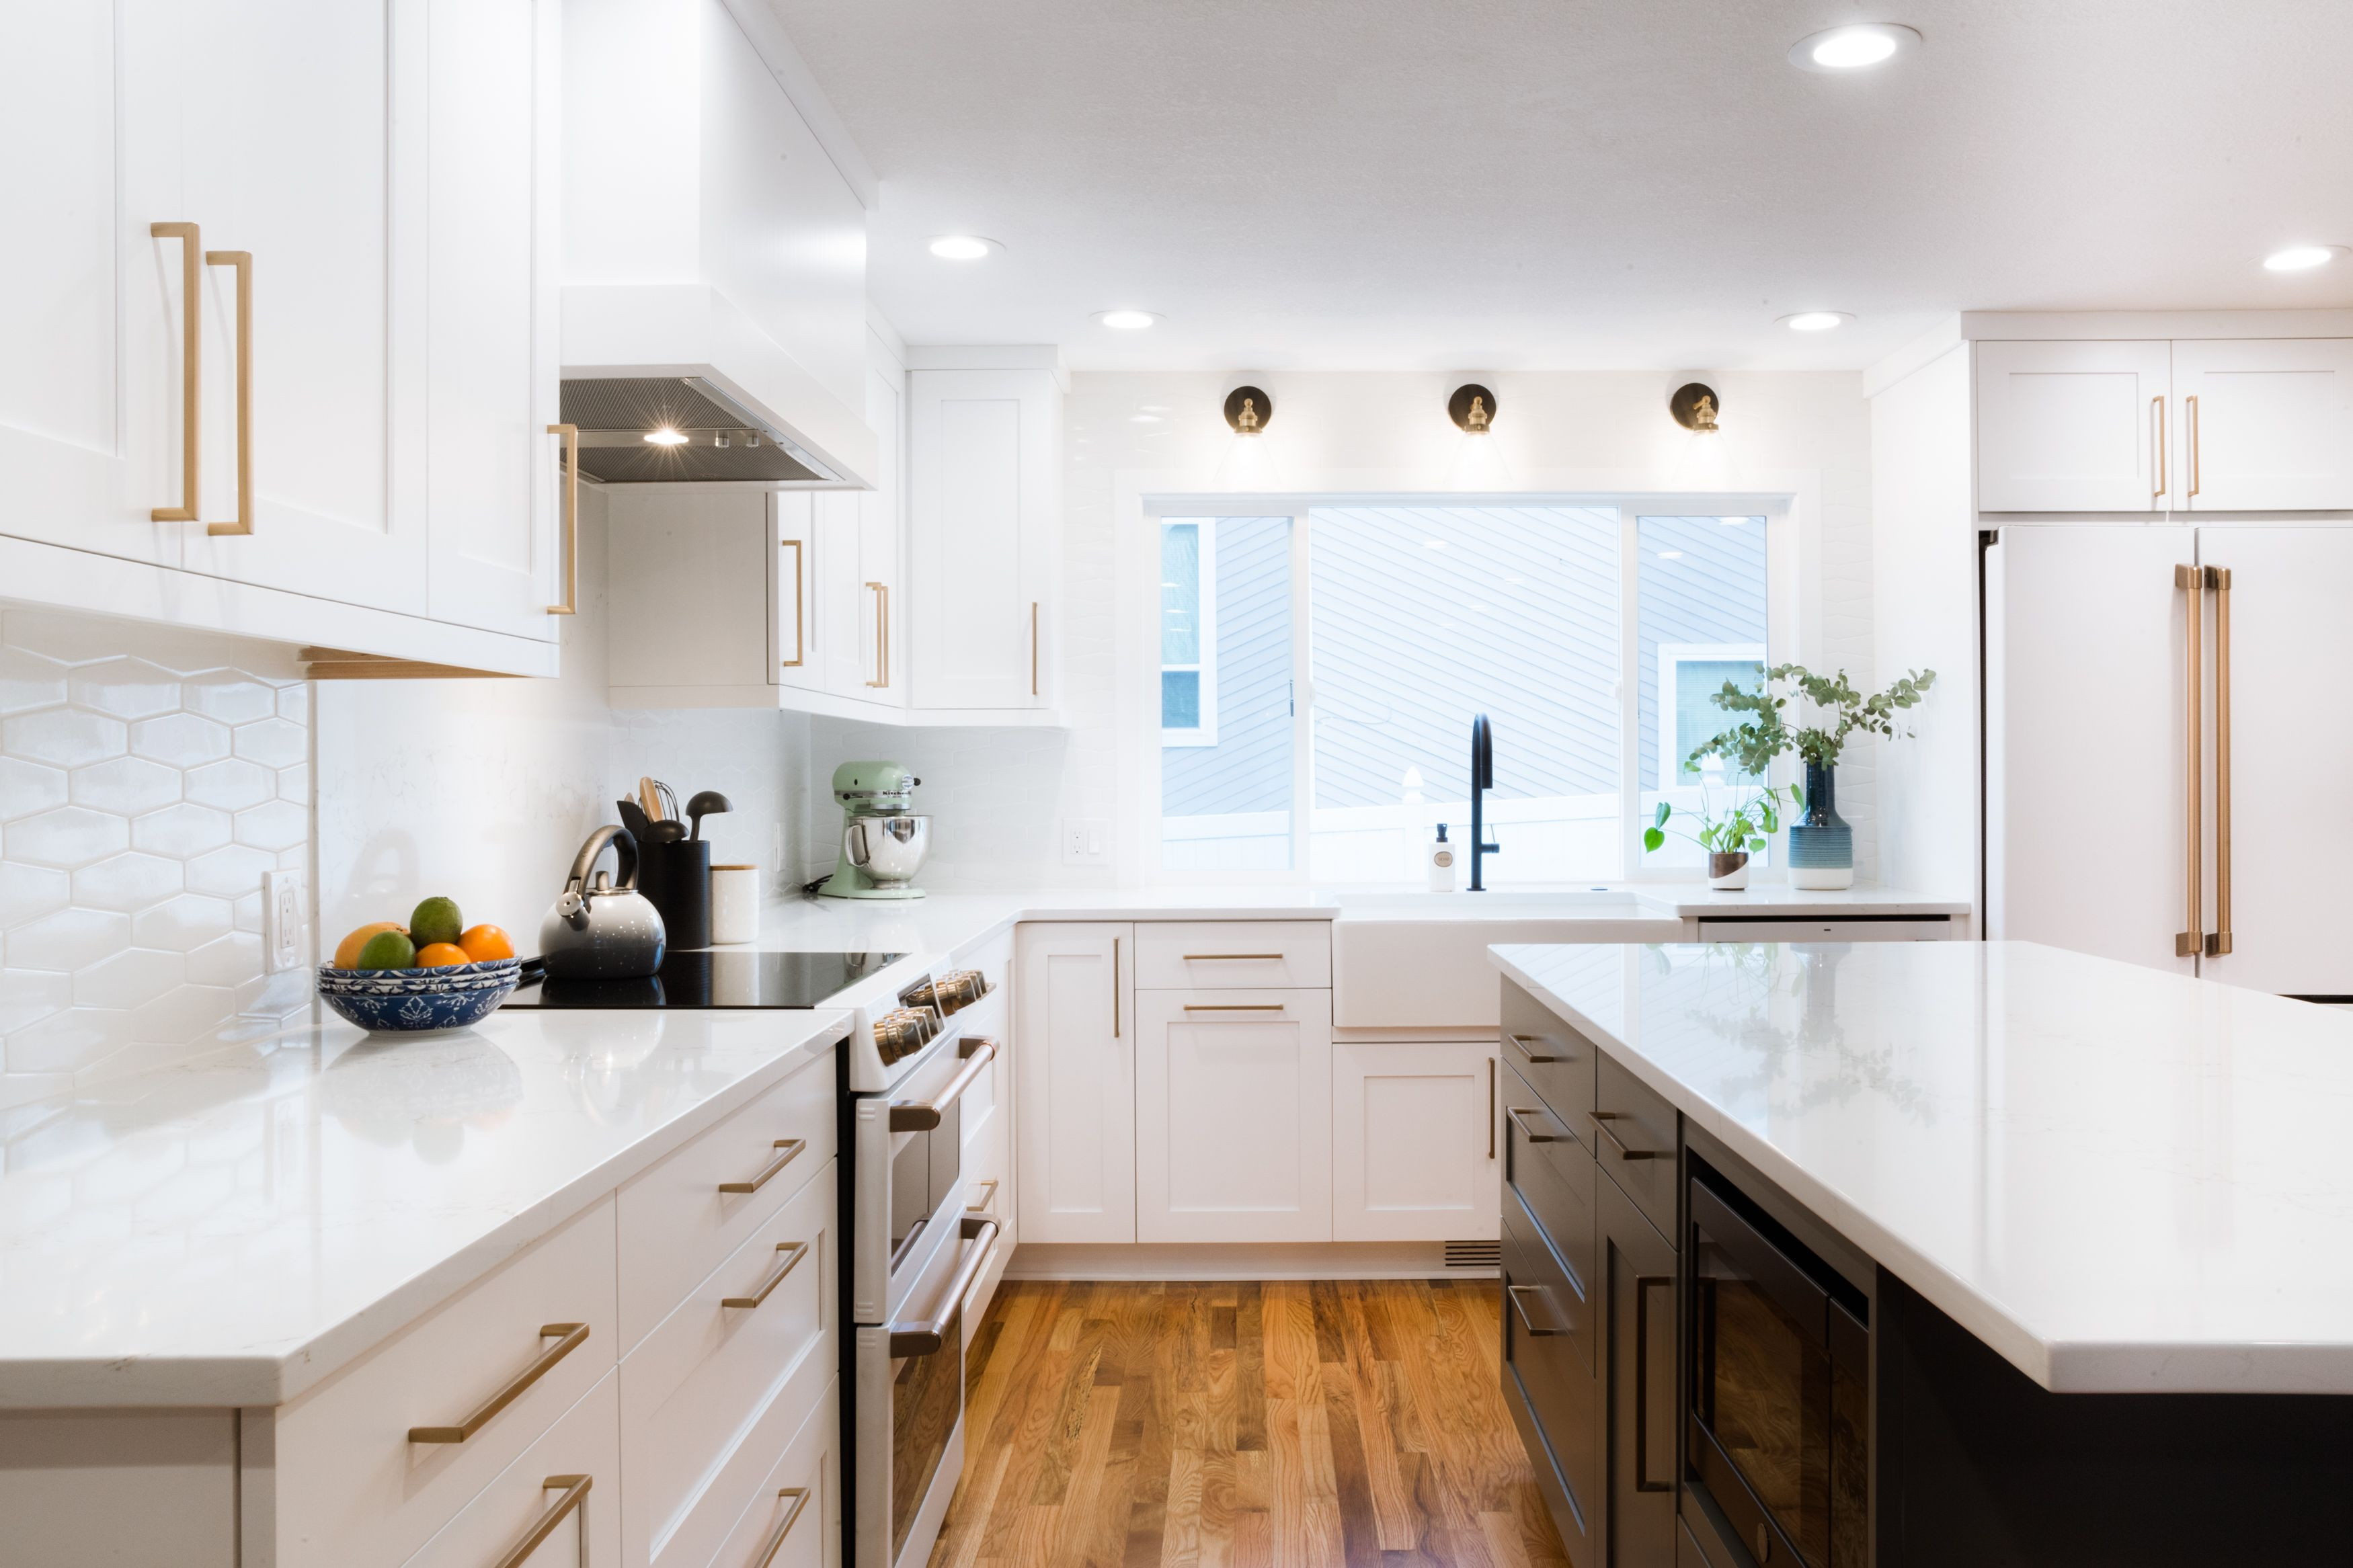 Super Clean Bright Kitchen Remodel Remodelingkitchenideas Remodelingideas Remodelingkitchen Kitche Kitchen Remodel Home Remodeling Straight Line Designs